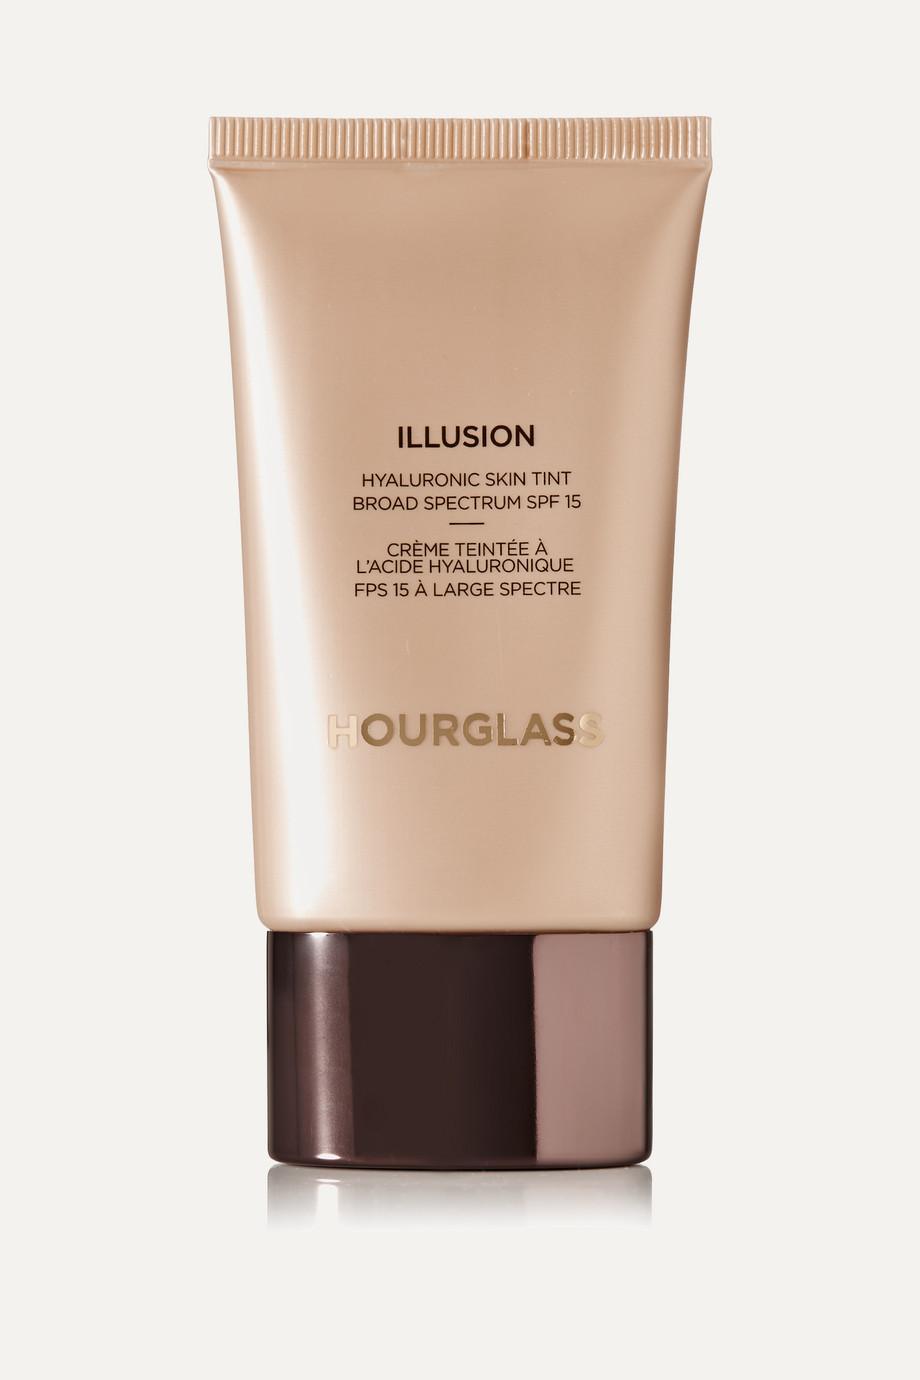 Hourglass Illusion® Hyaluronic Skin Tint SPF15 - Nude, 30ml